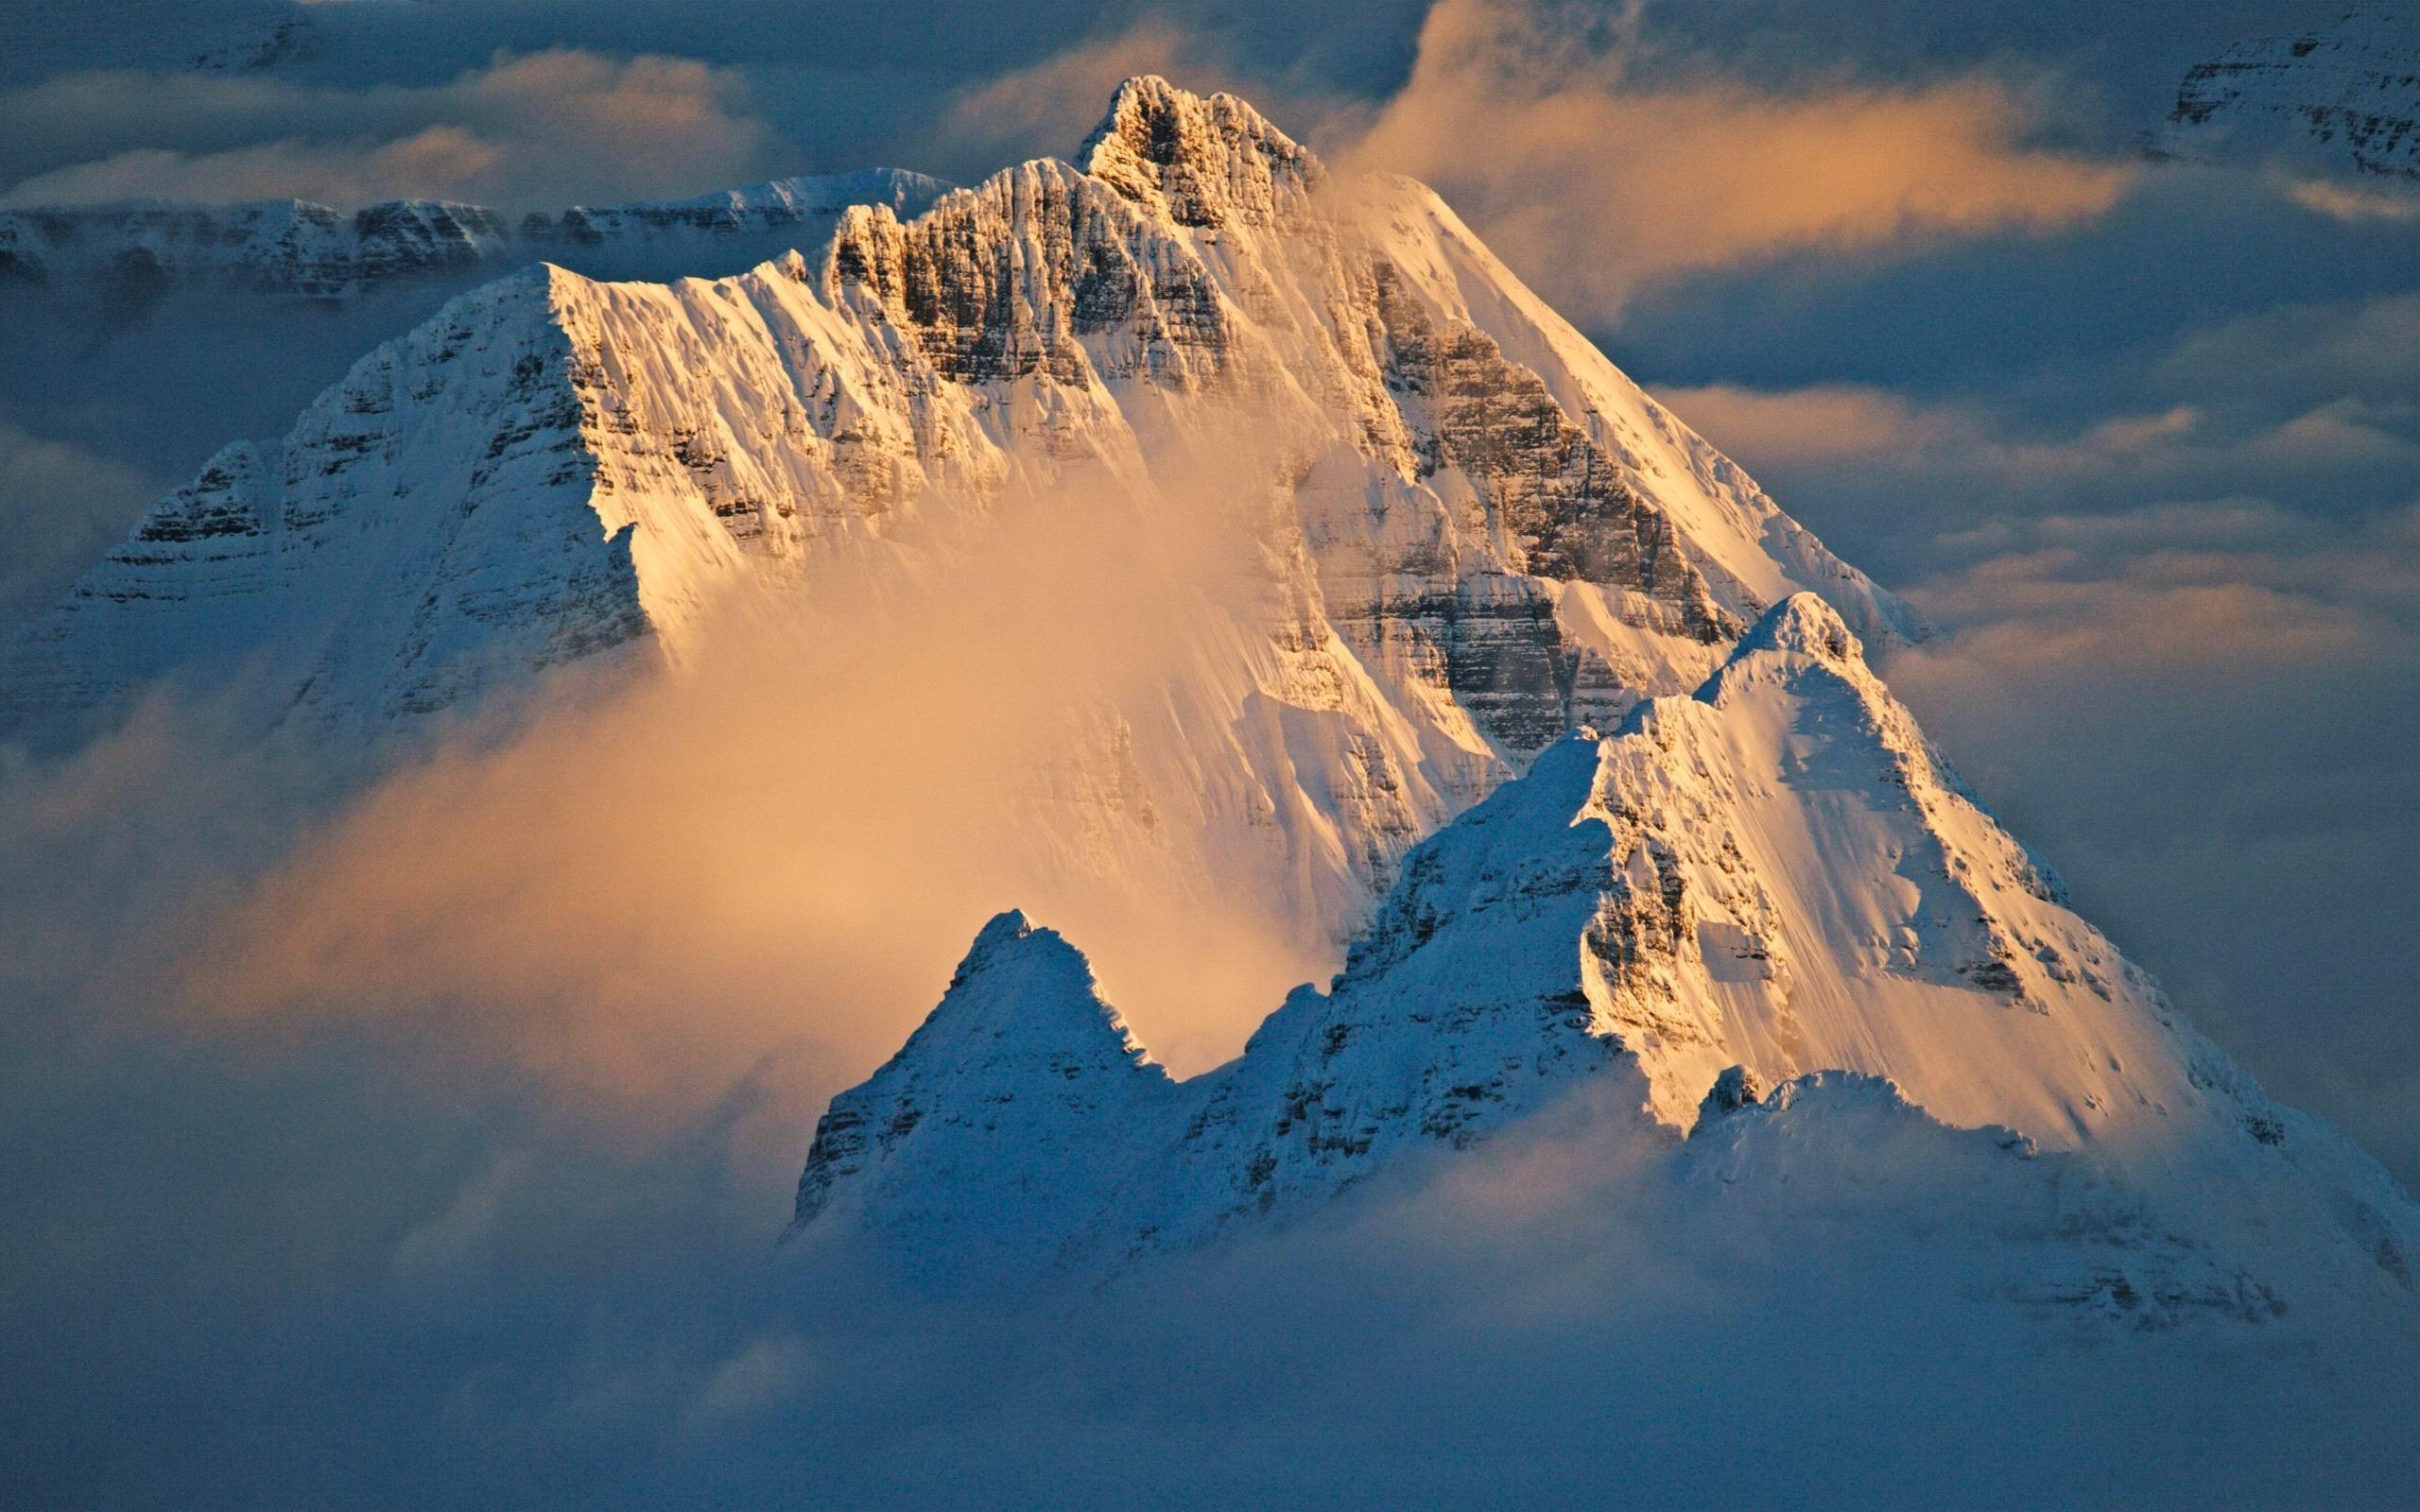 Rockies In Glacier National Park Mac Os X Mountain Lion Hd